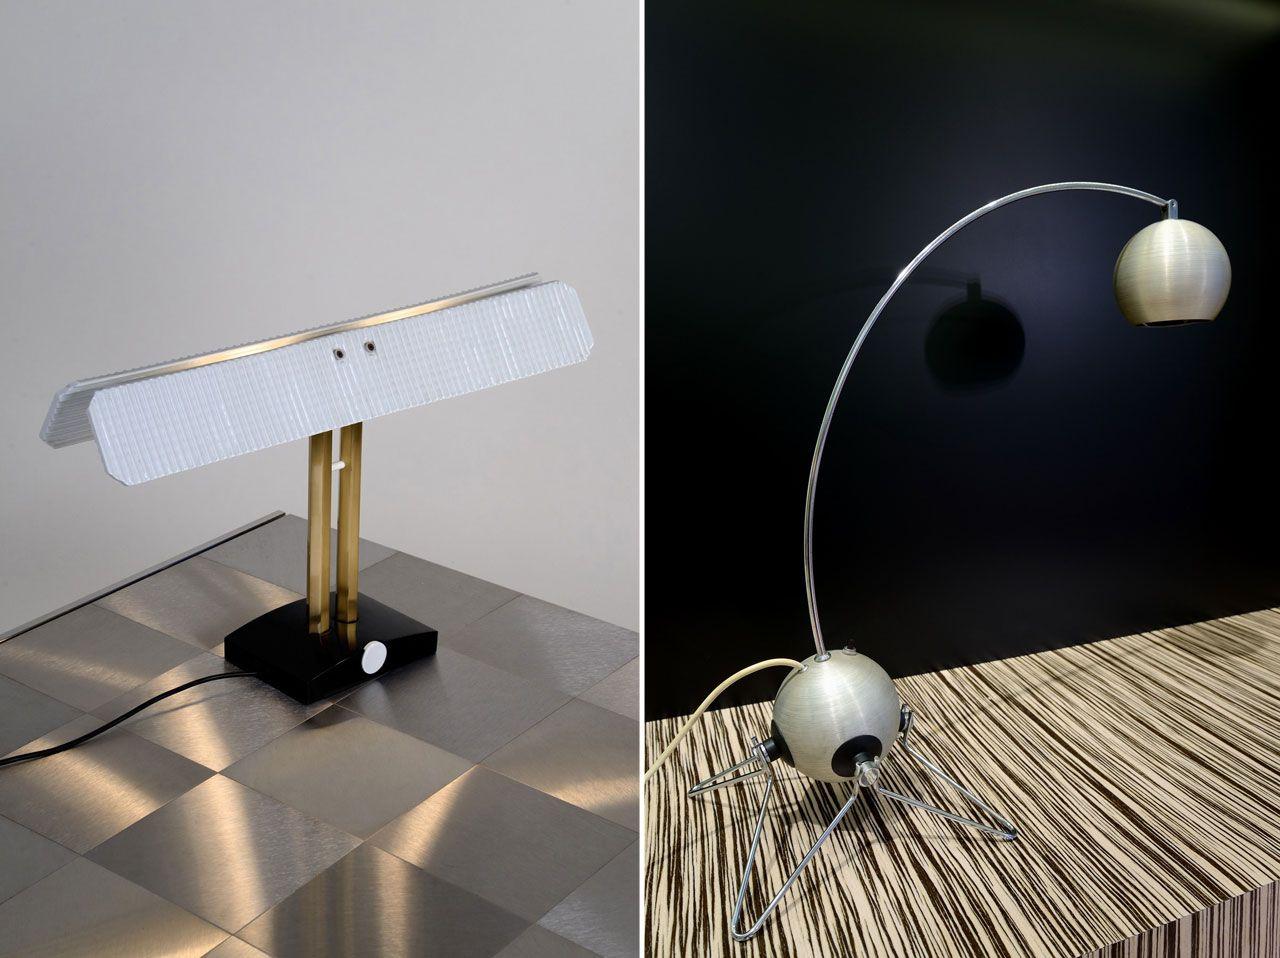 Left: Tobia Scarpa, Table lamp Capalonga, Flos, 1982 Right: Gino Sarfatti, Table lamp model 599, Arteluce, 1968 @ Galleria Fragile , Via San Damiano 2, Milan